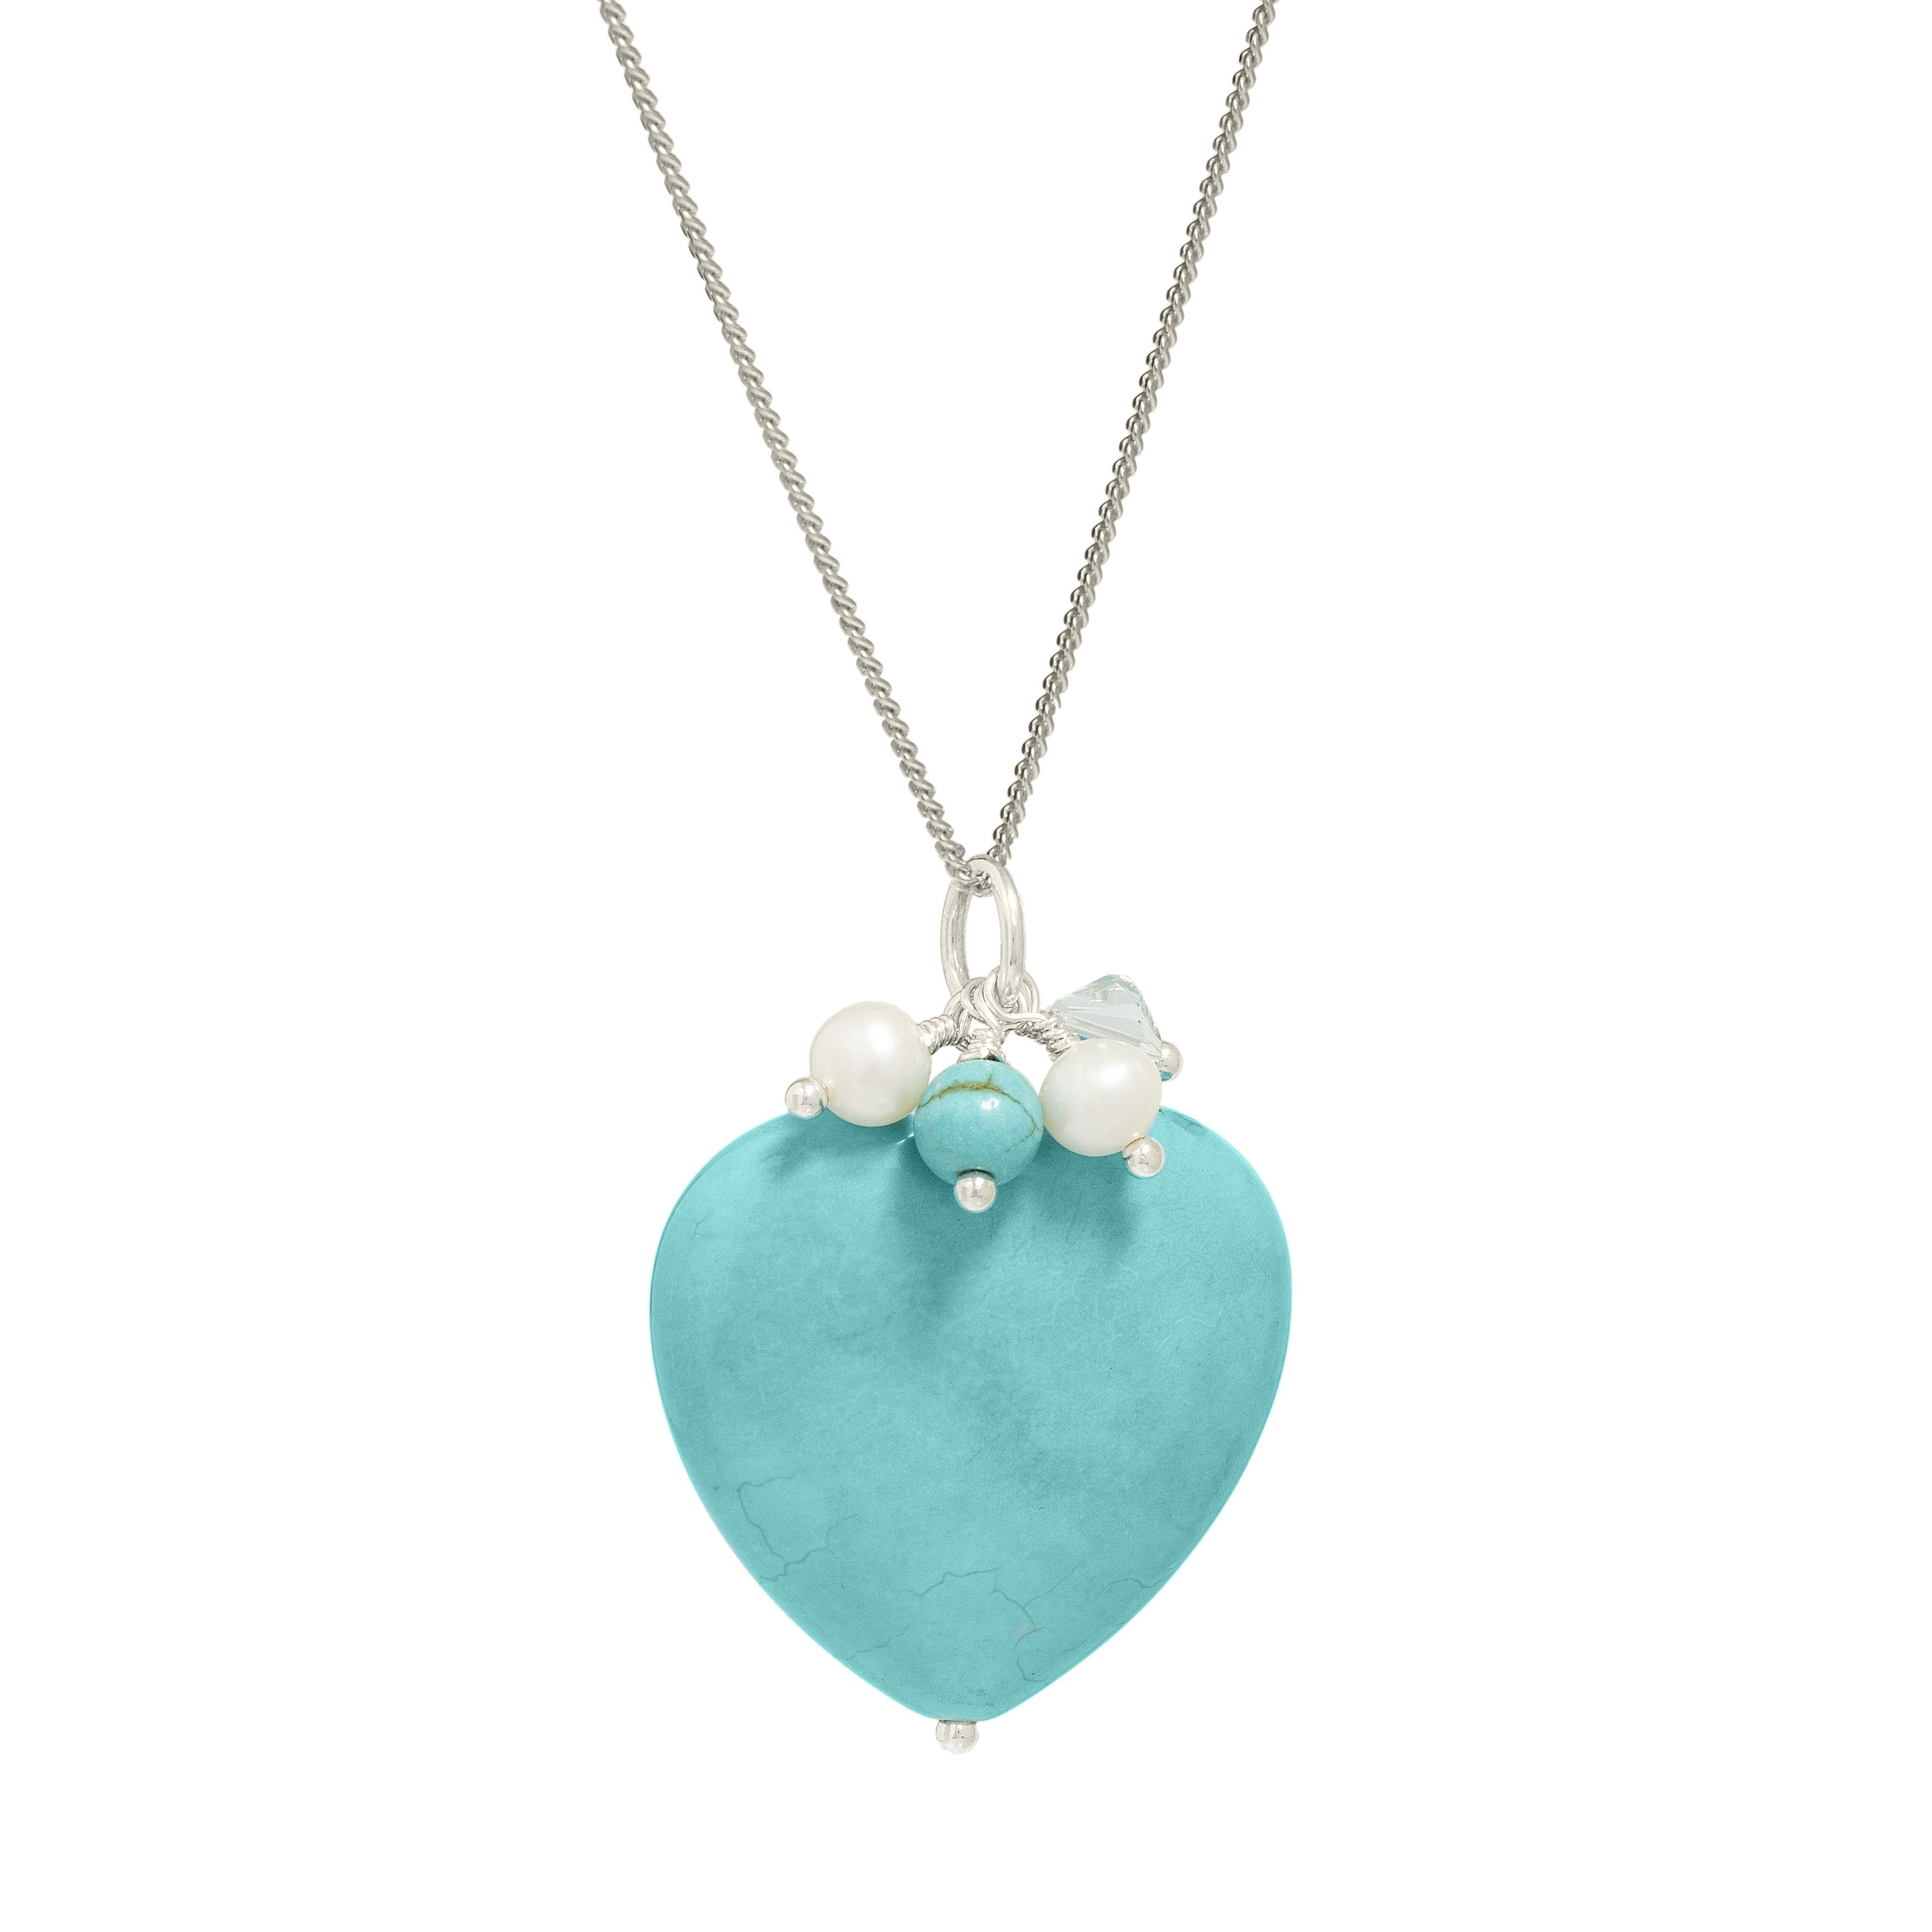 323a6eea4 Biba & Rose - Feshwater Pearl and Silver Jewellery www.bibadesigns.co.uk